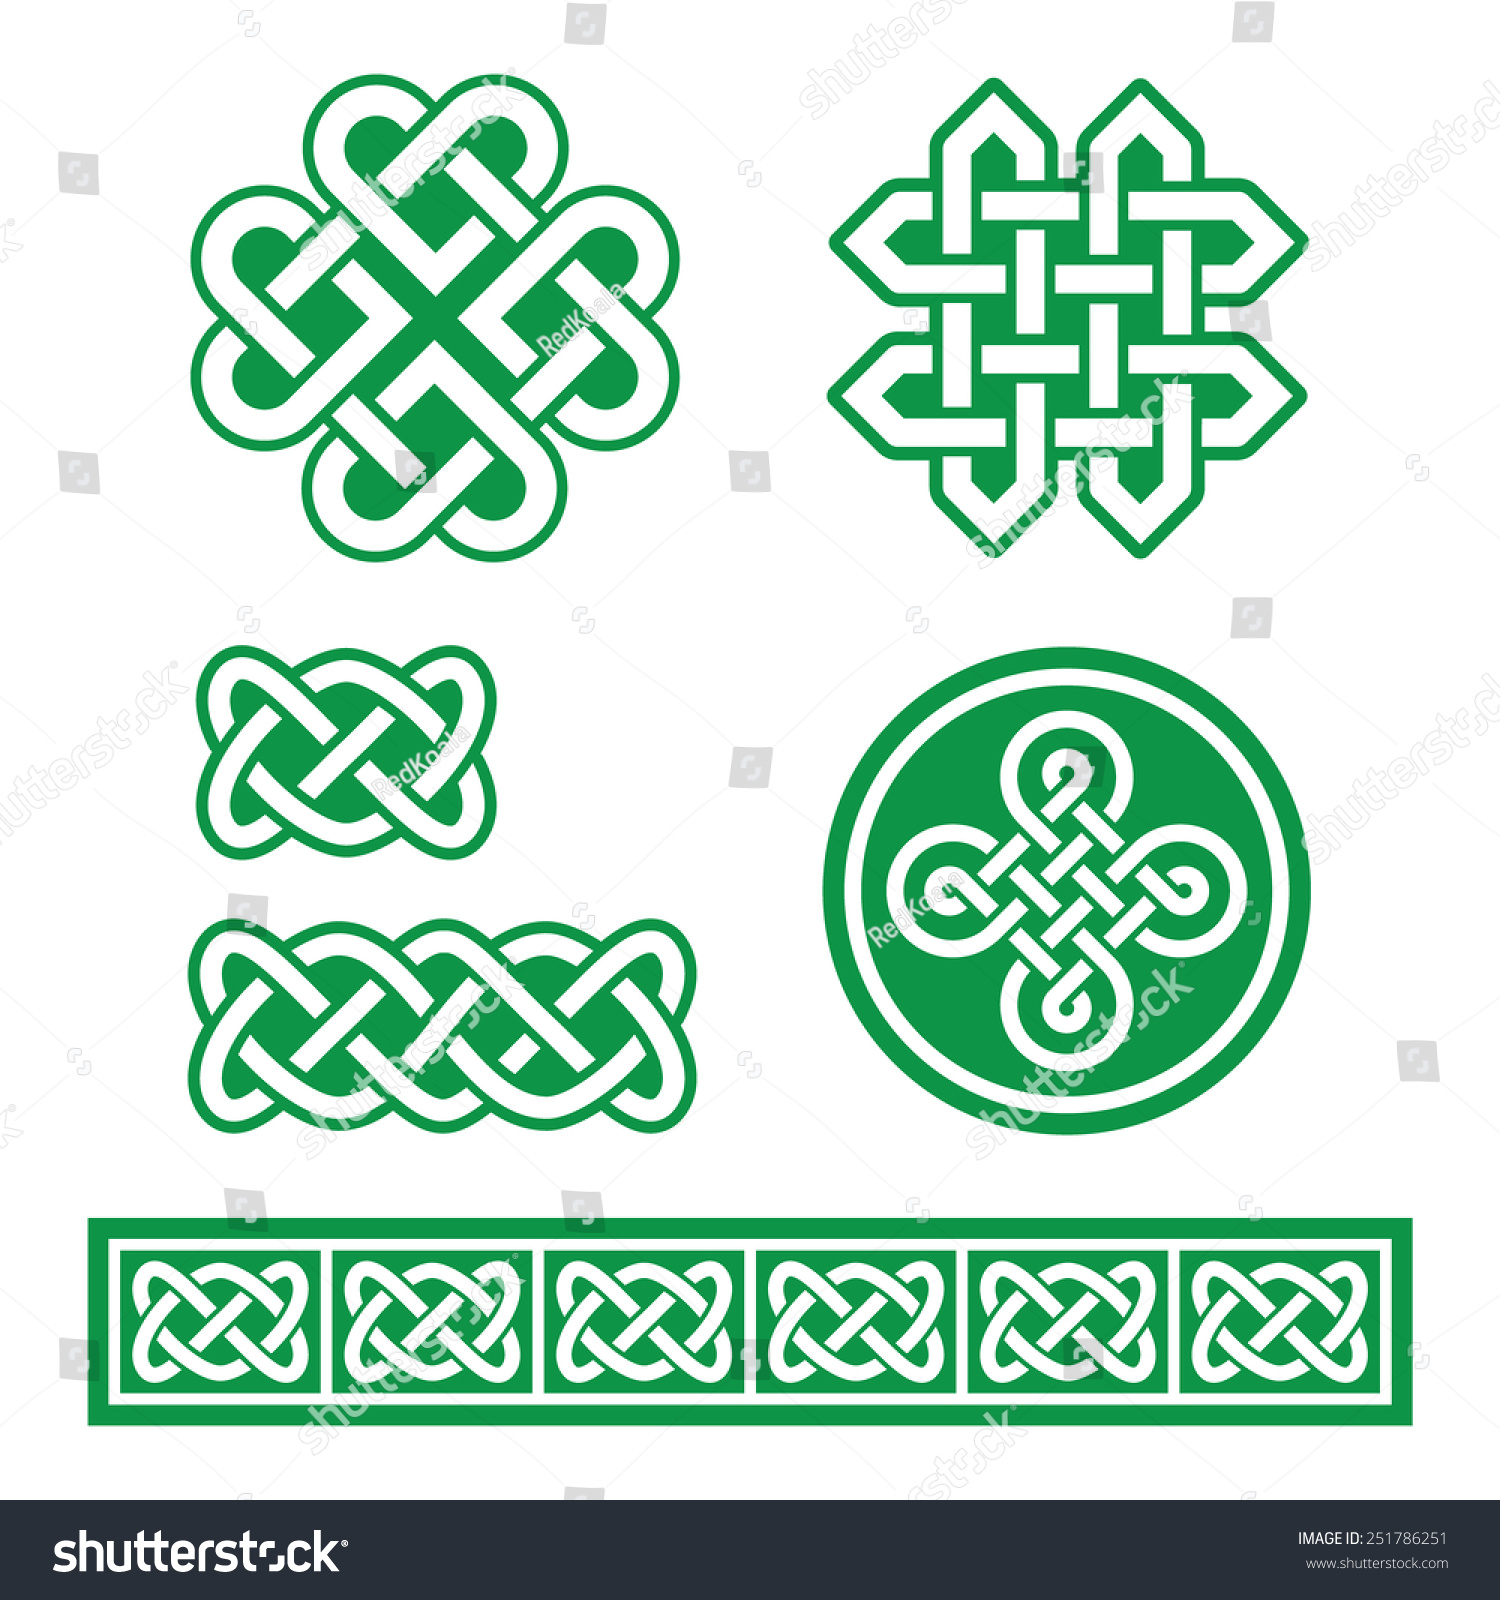 Irish Patterns New Design Inspiration